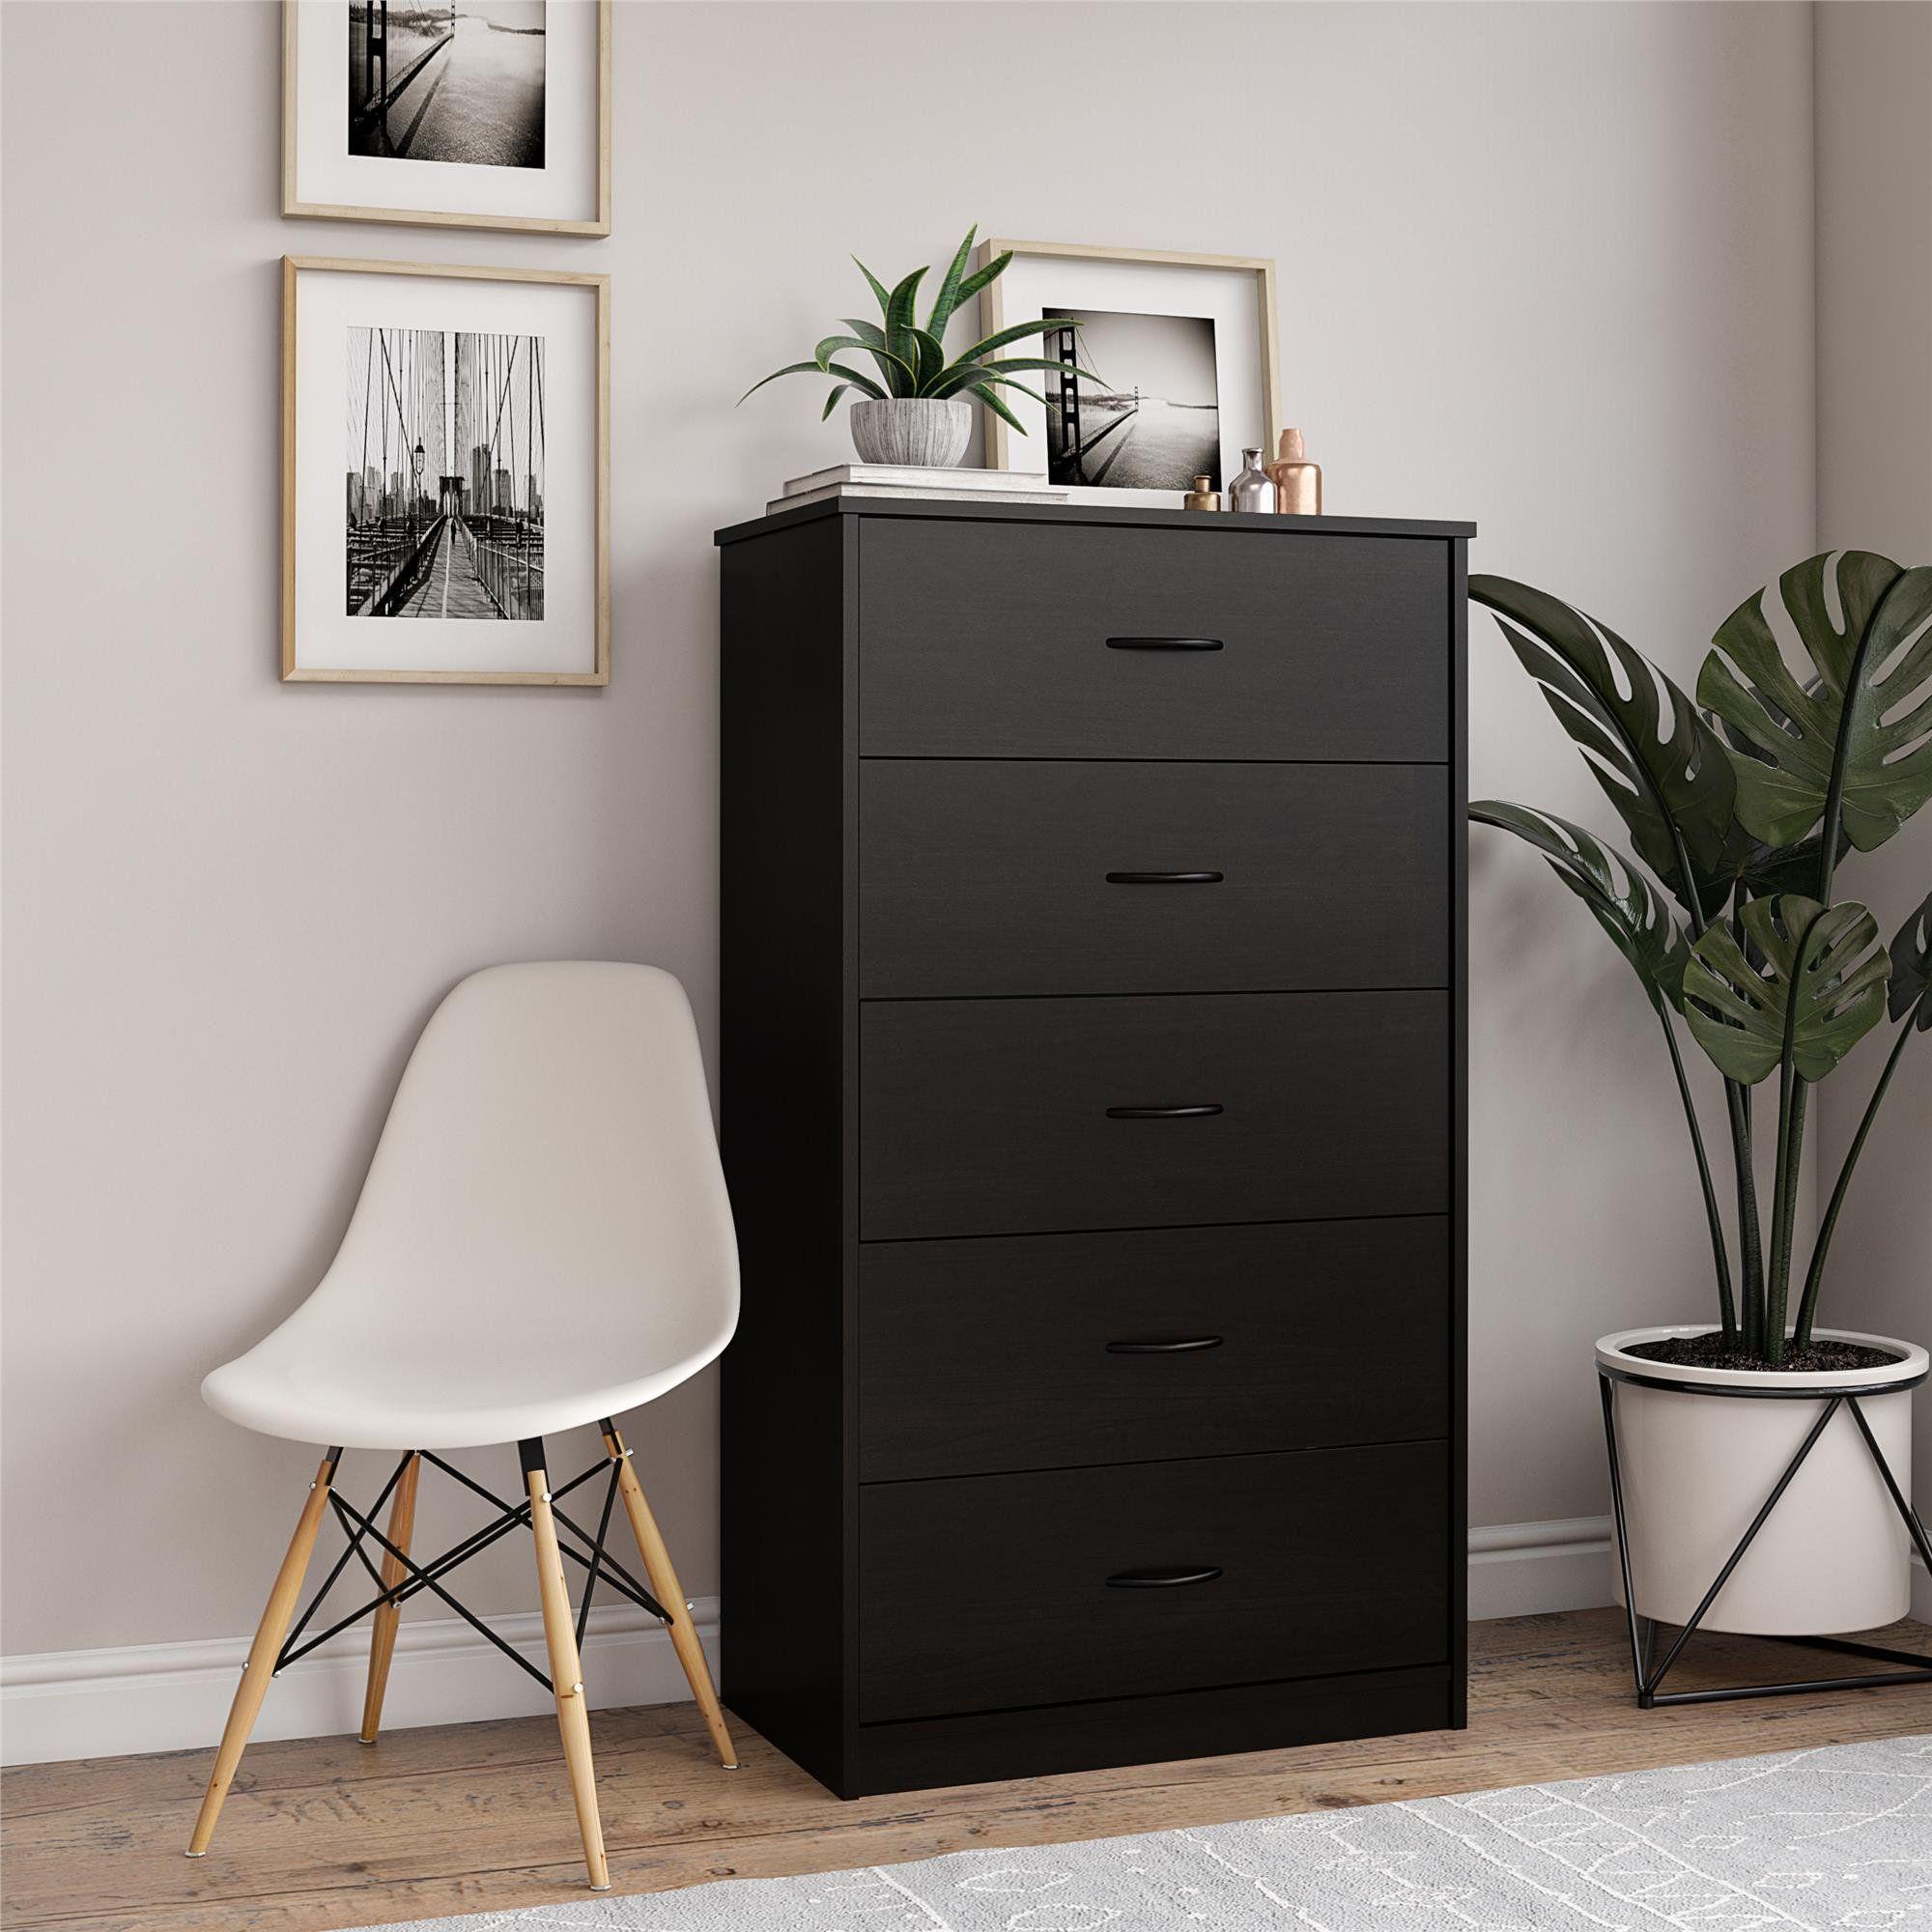 Mainstays Classic 5 Drawer Dresser Espresso Finish Walmart Com In 2021 Black Bedroom Design Black Bedroom Furniture Clothes Cabinet Bedroom [ 2000 x 2000 Pixel ]